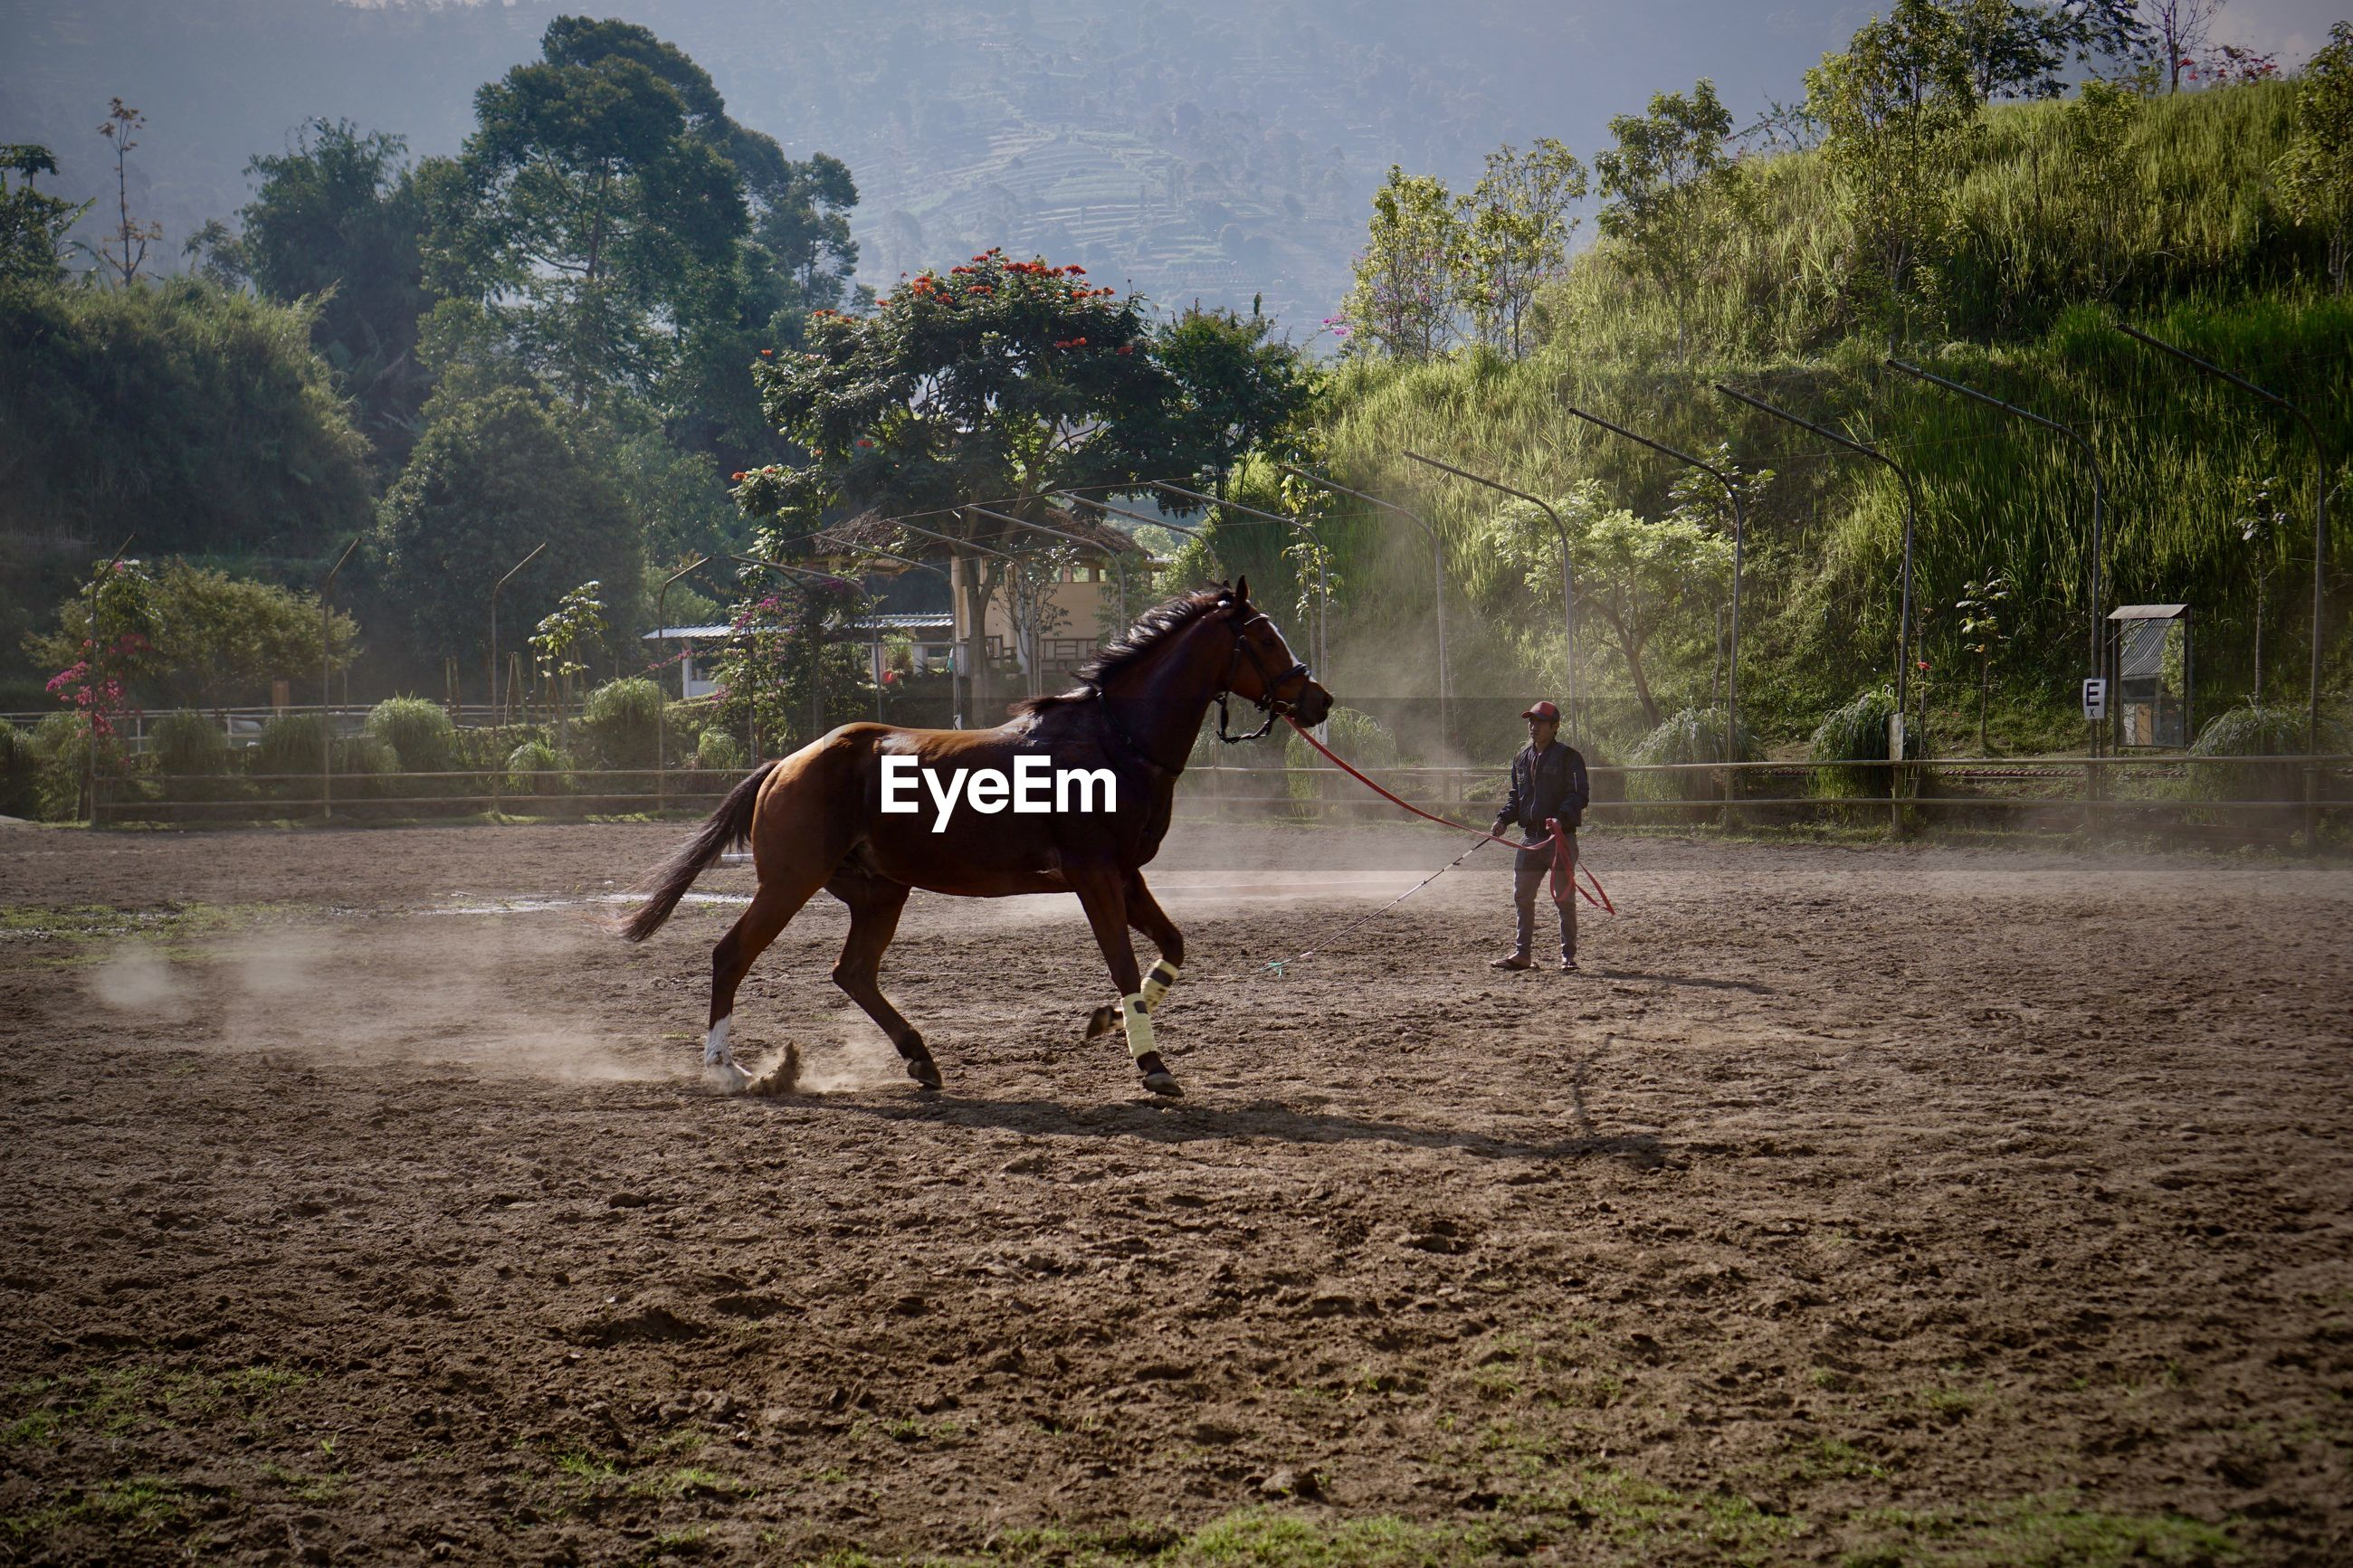 HORSES ON FIELD